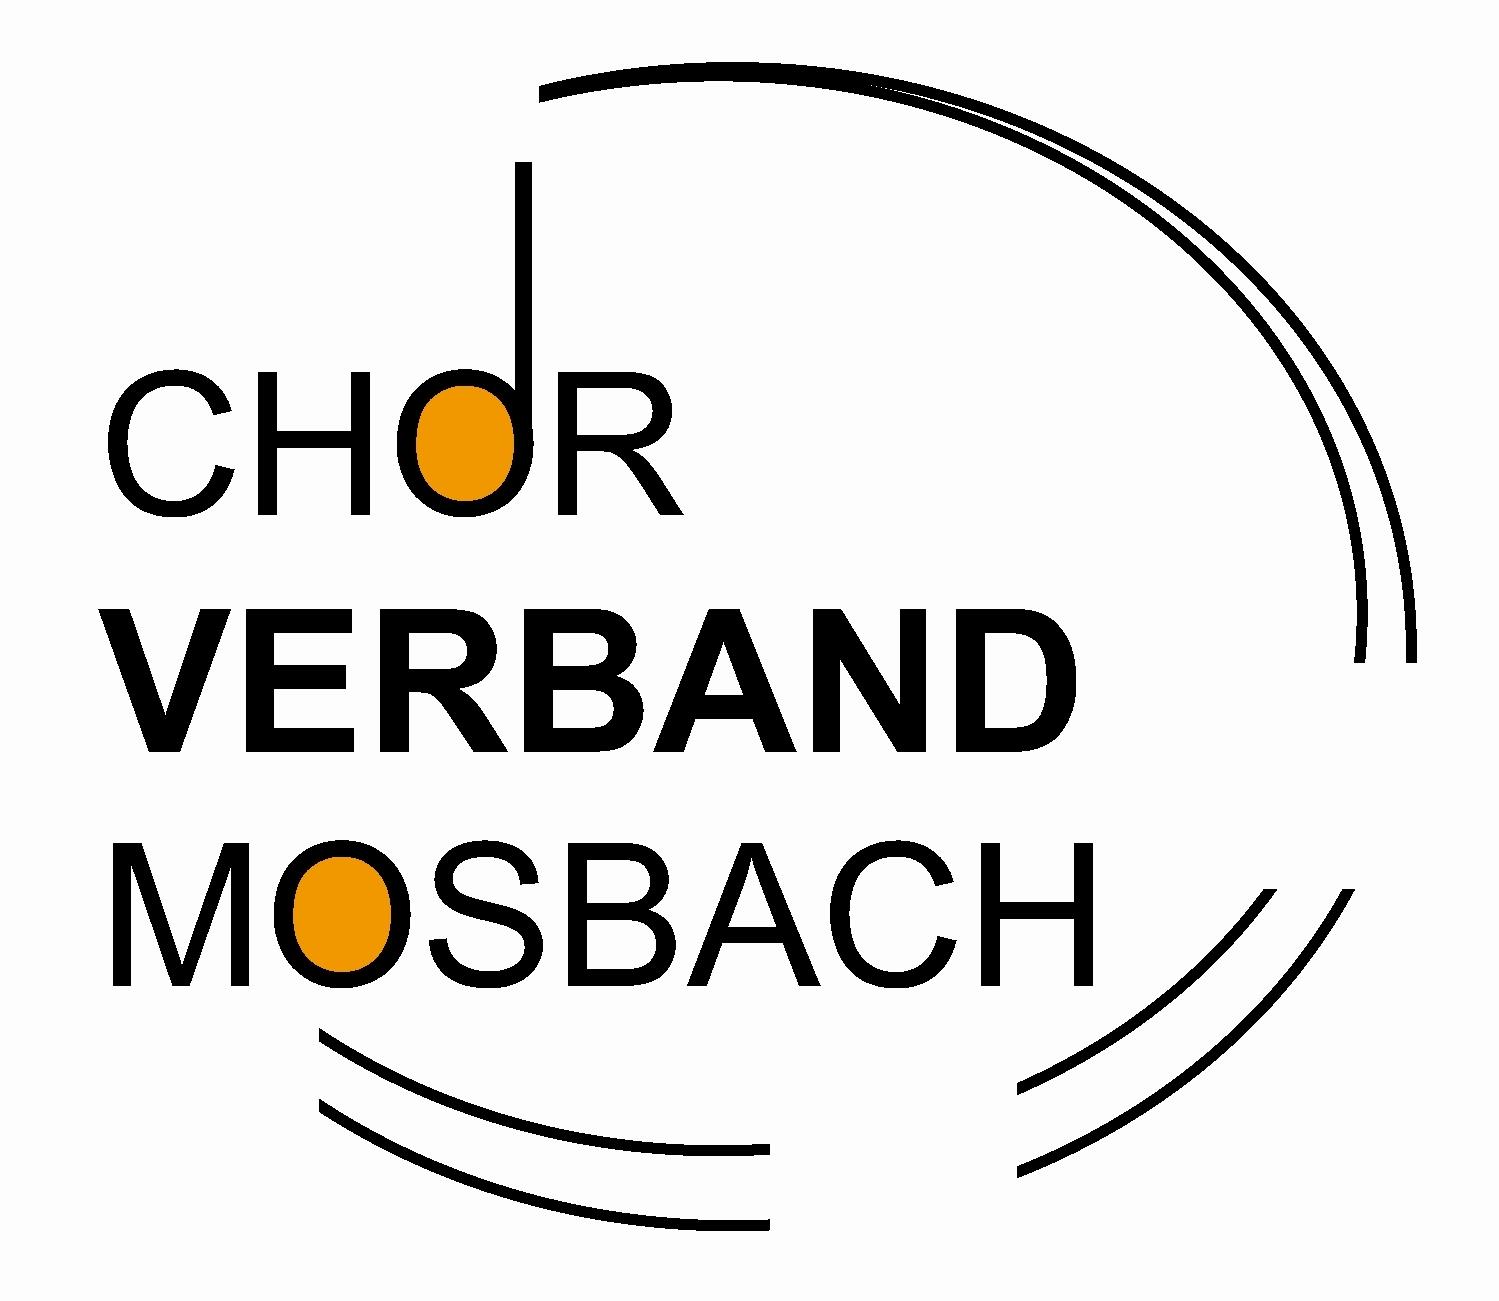 Chorverband Mosbach